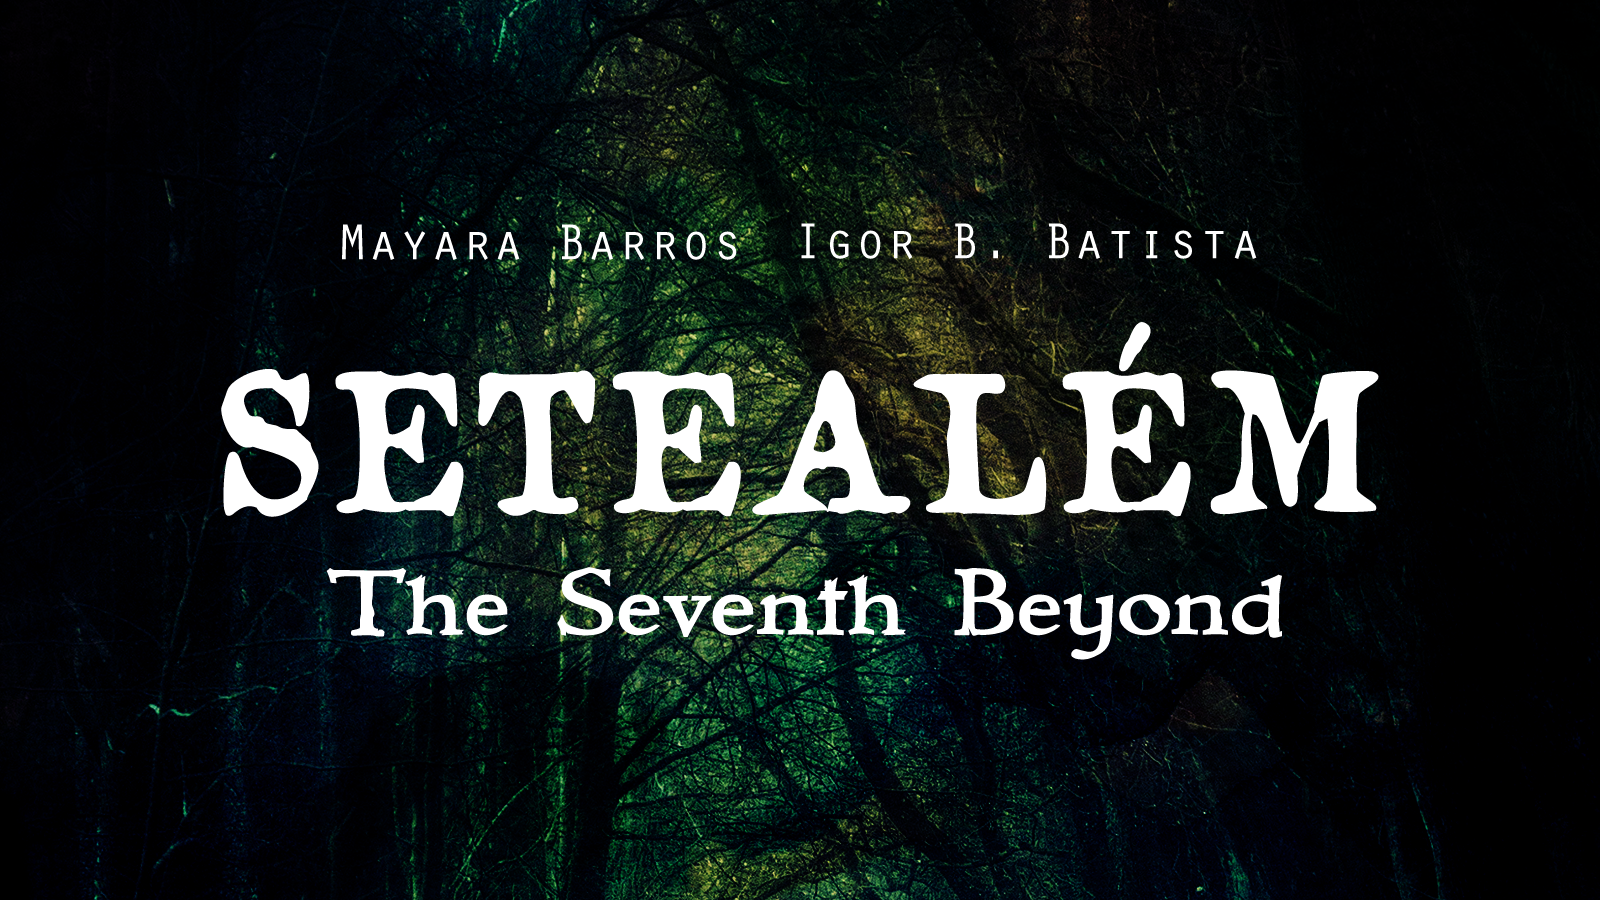 Setealém: The Seventh Beyond